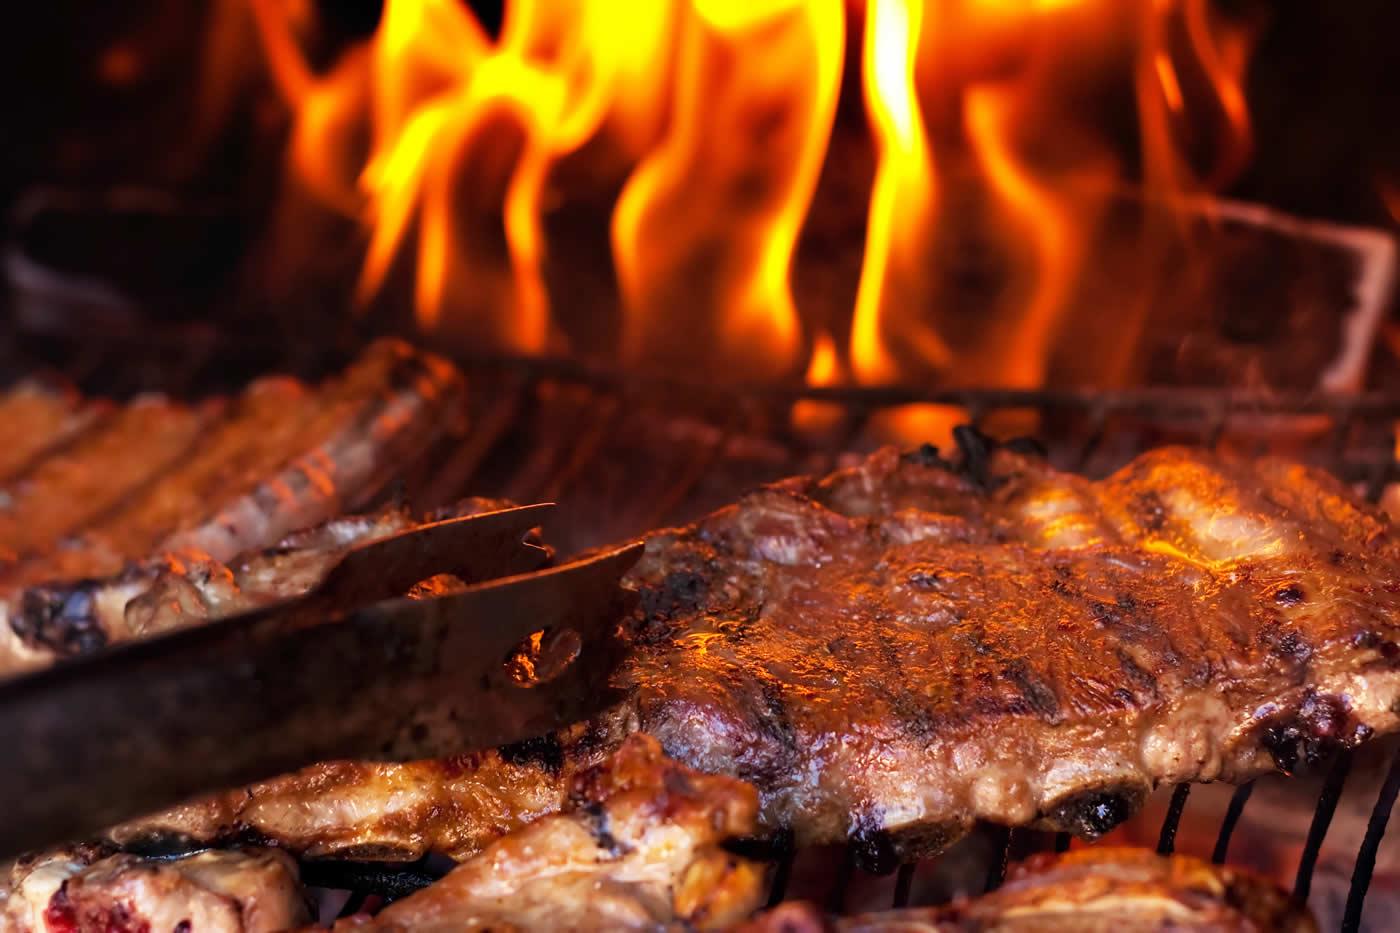 Amazing BBQ Ribs - Professional Barbecue Grill Recipe